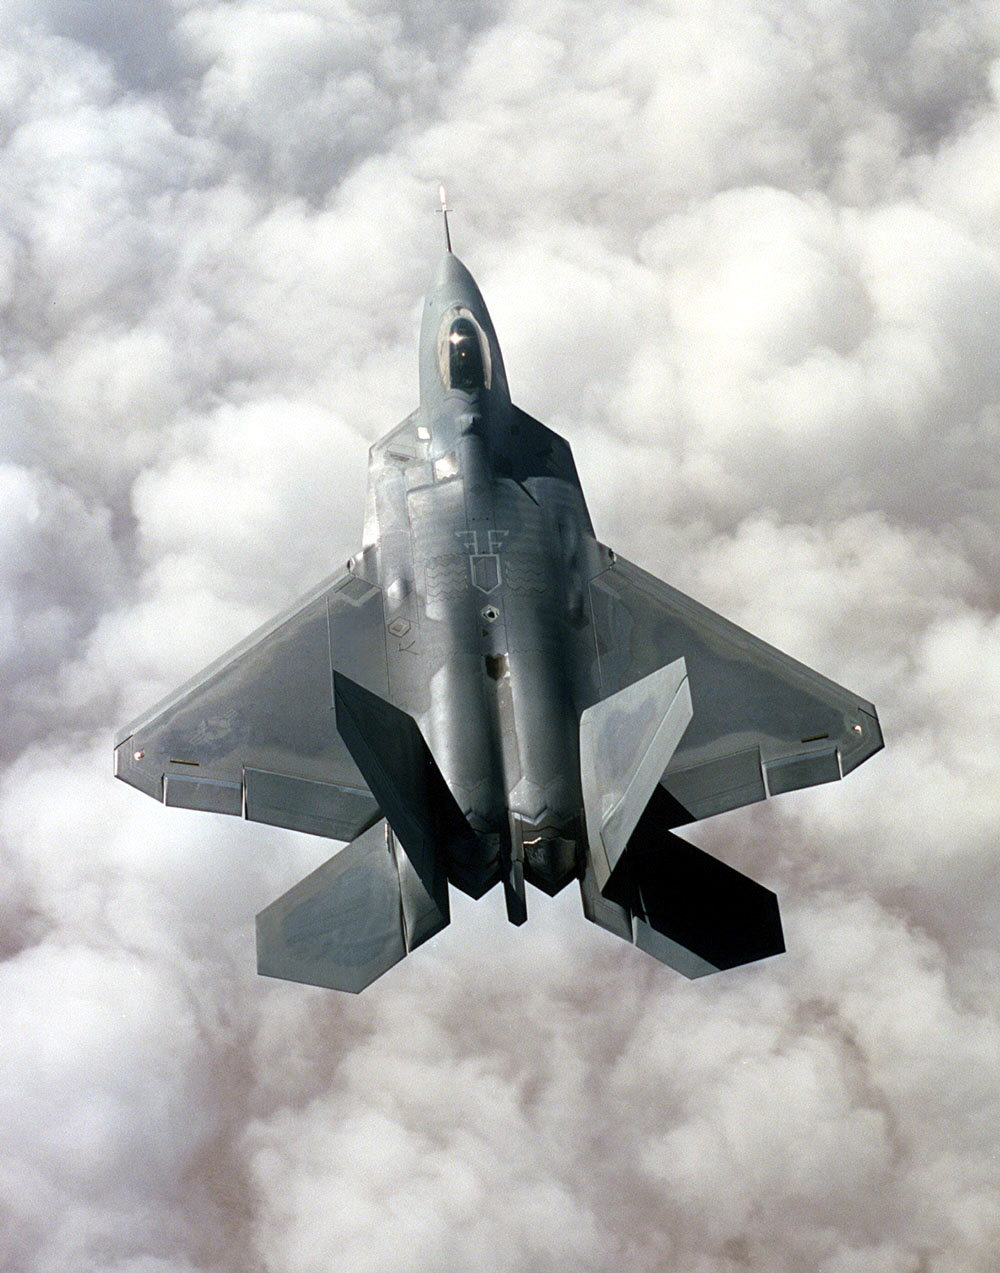 F-22 Raptor - Page 2 99110510